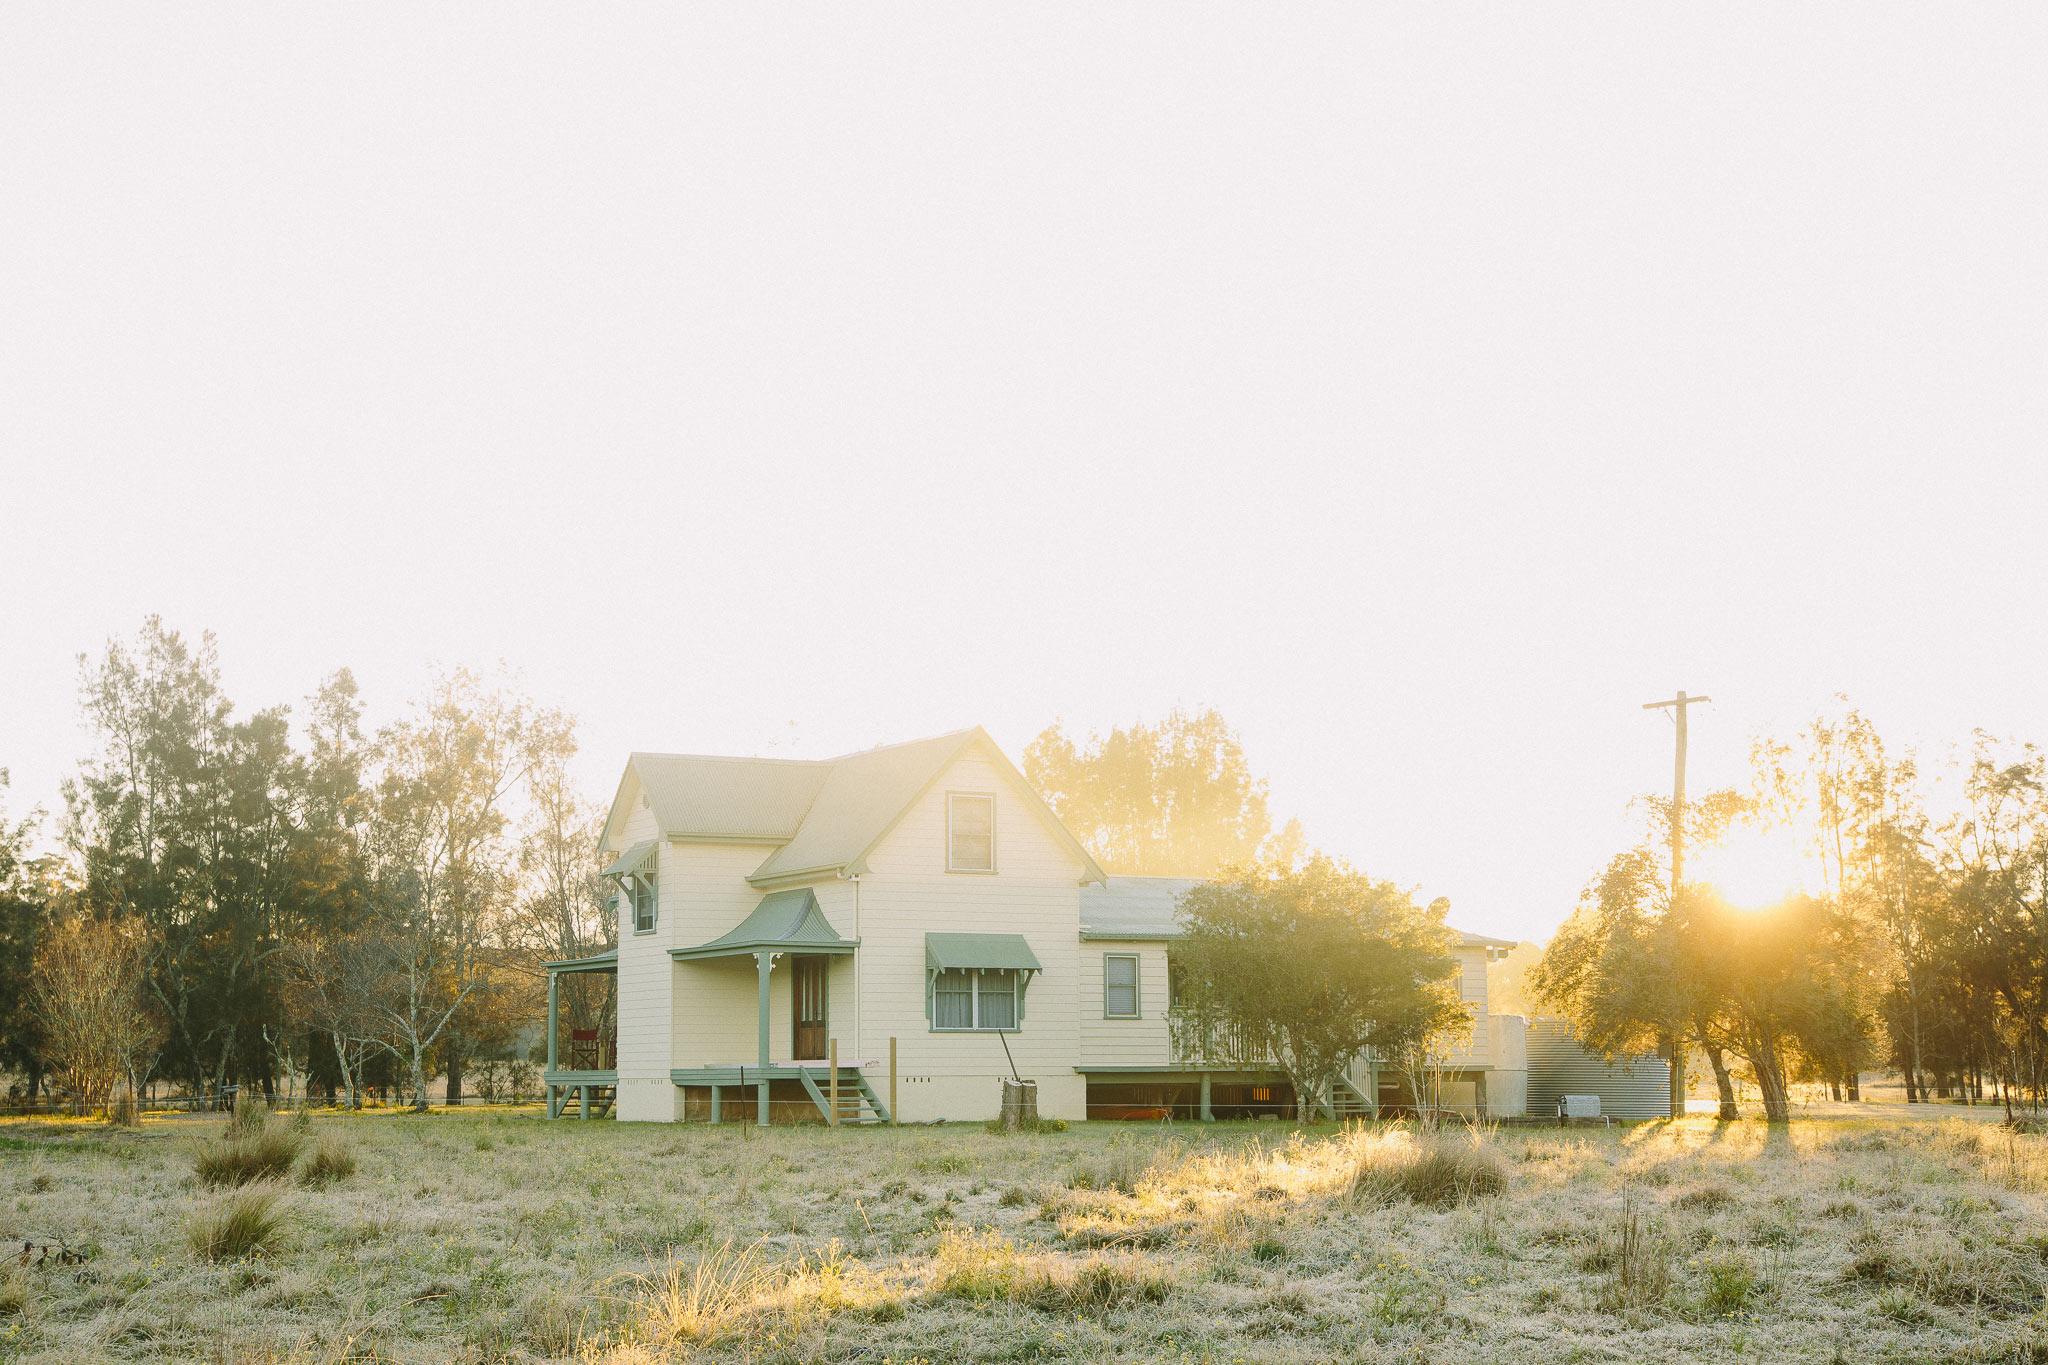 Shinglers-Cottage-8.jpg